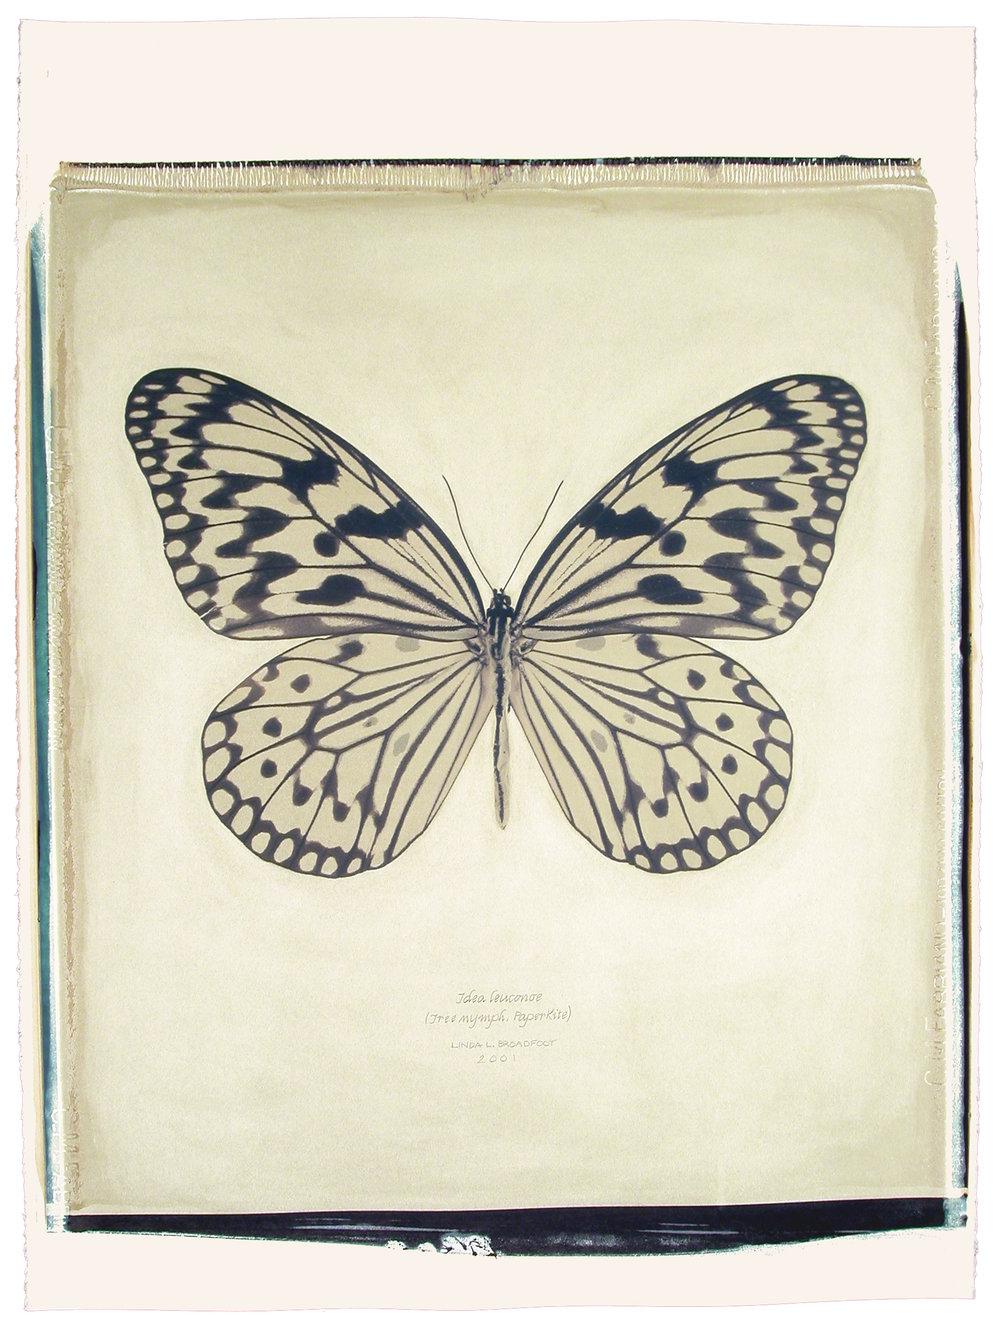 Idea leuconoe  (Tree Nymph, Paper Kite), 2001